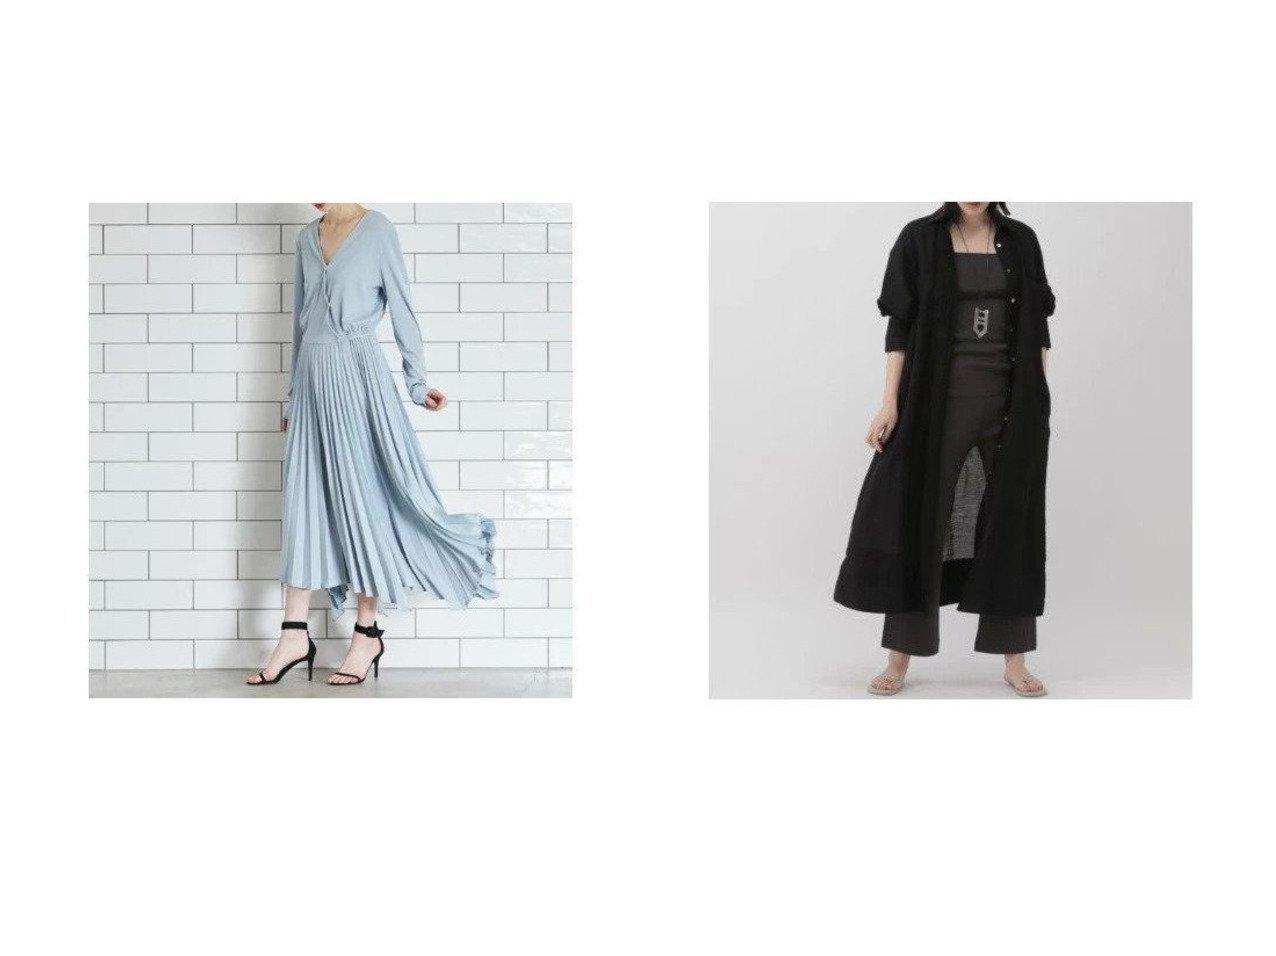 【CLEAR IMPRESSION/クリアインプレッション】の《INED CLARO》カットプリーツワンピース&【Chaos/カオス】のガーランドシャツワンピース 【ワンピース・ドレス】おすすめ!人気、トレンド・レディースファッションの通販 おすすめで人気の流行・トレンド、ファッションの通販商品 メンズファッション・キッズファッション・インテリア・家具・レディースファッション・服の通販 founy(ファニー) https://founy.com/ ファッション Fashion レディースファッション WOMEN ワンピース Dress シャツワンピース Shirt Dresses インド フランス ラグジュアリー 羽織 長袖 カットソー  ID:crp329100000029334